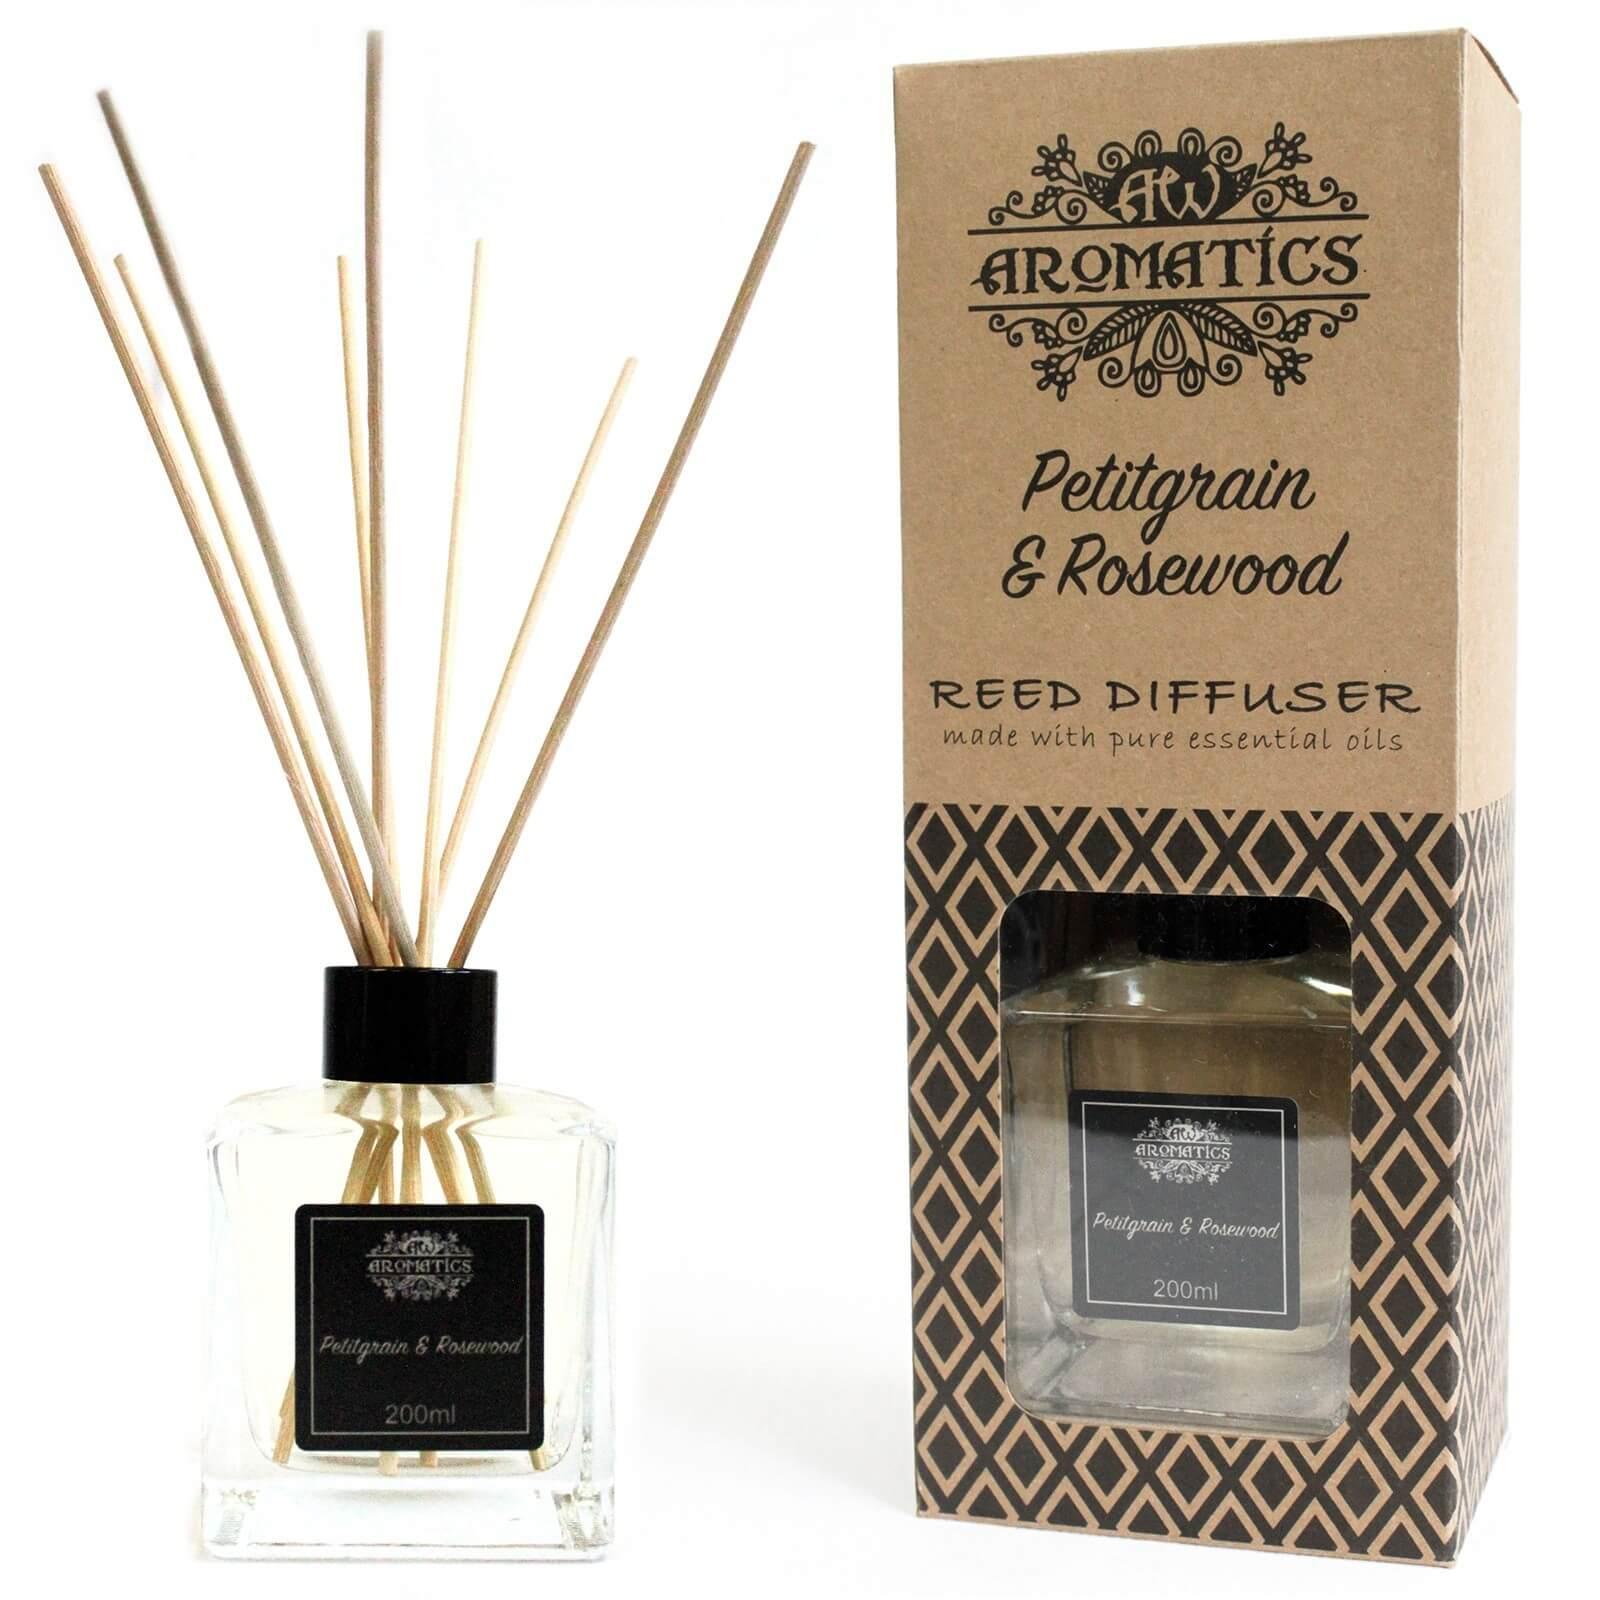 essential oil reed diffuser - petitgrain & rosewood